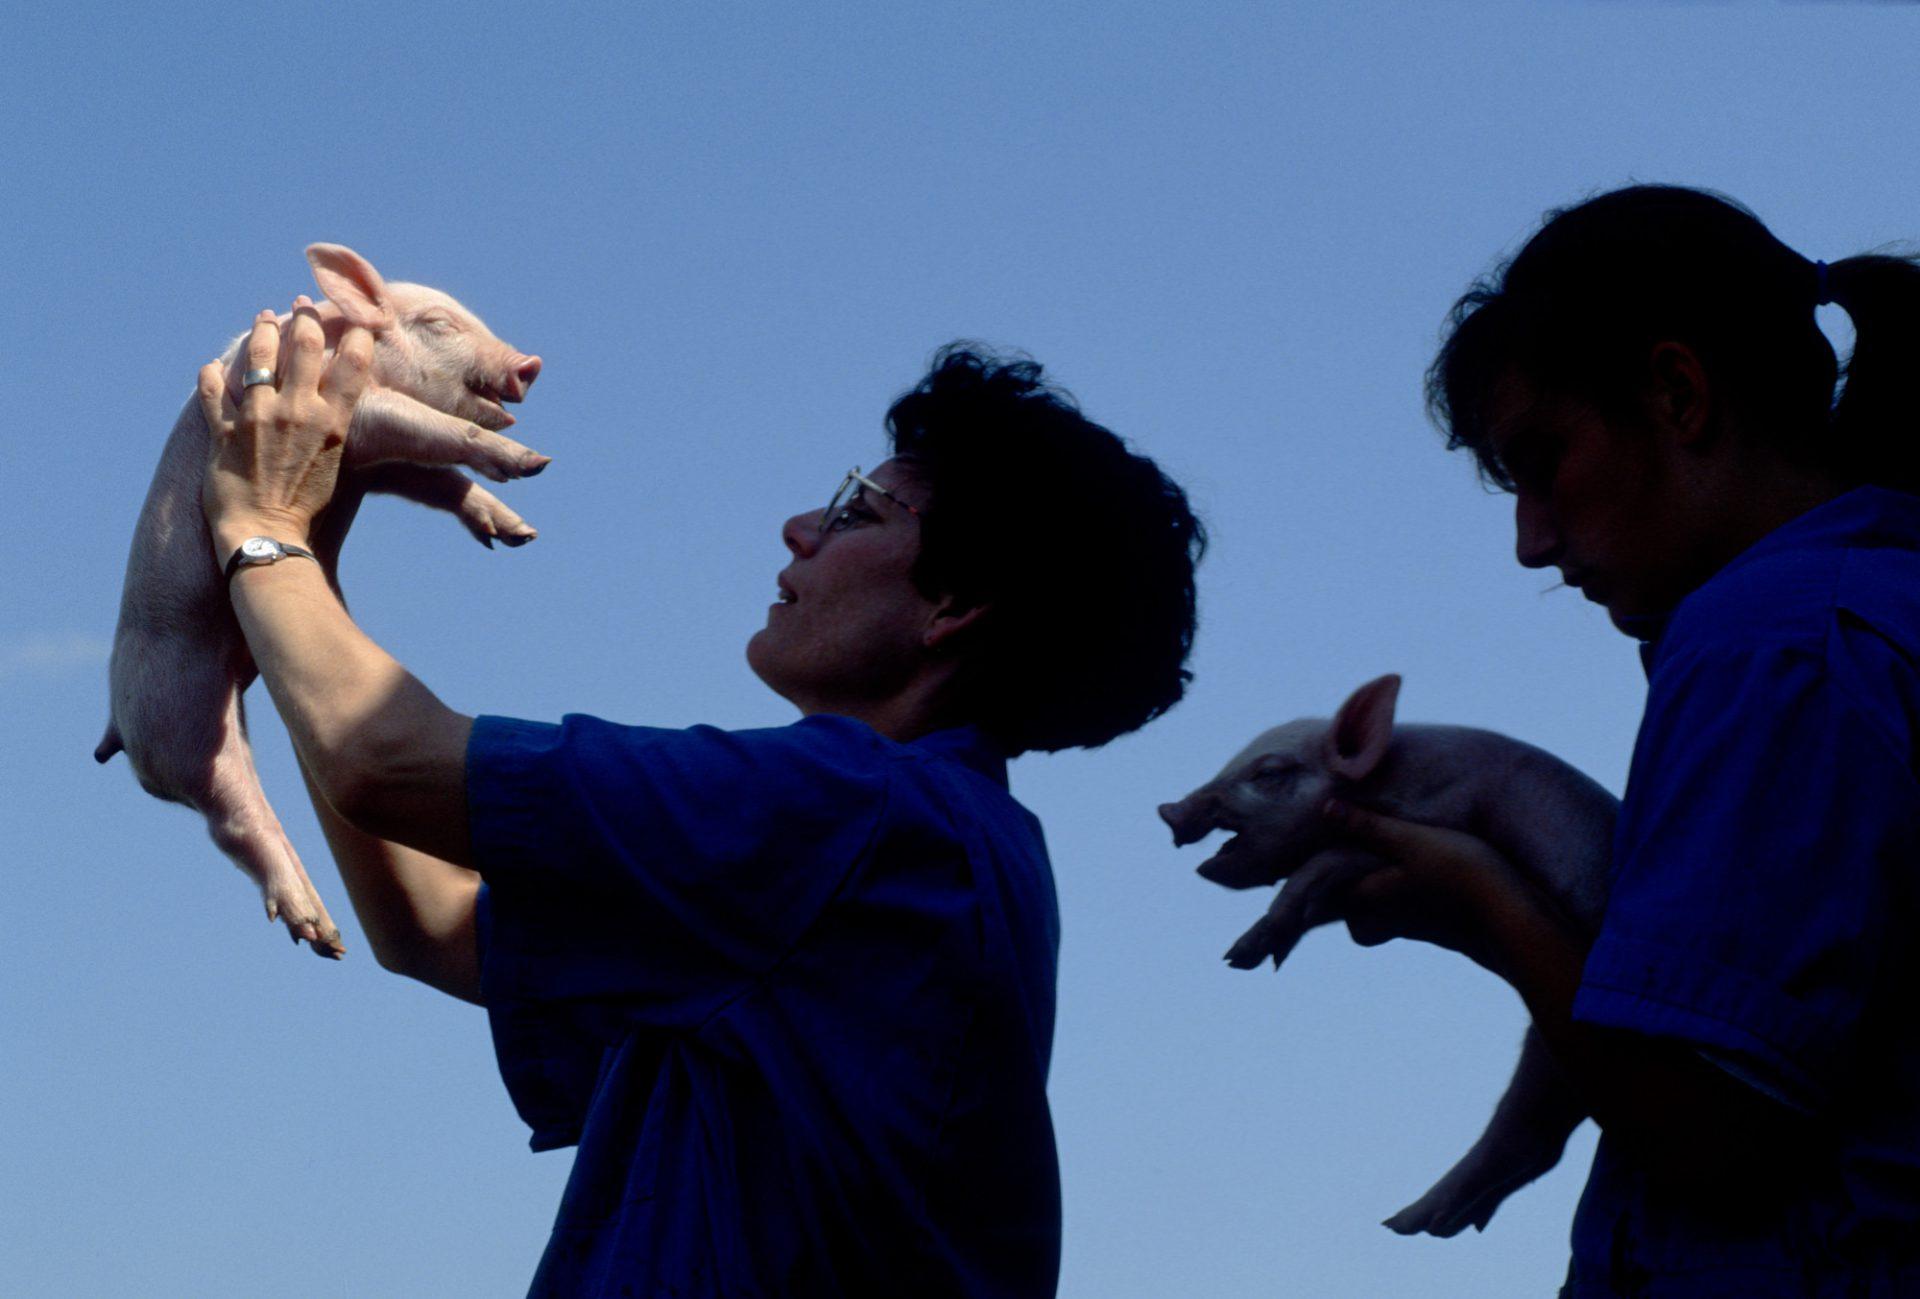 Photo: A woman holds up a piglet, Bennet, Nebraska.